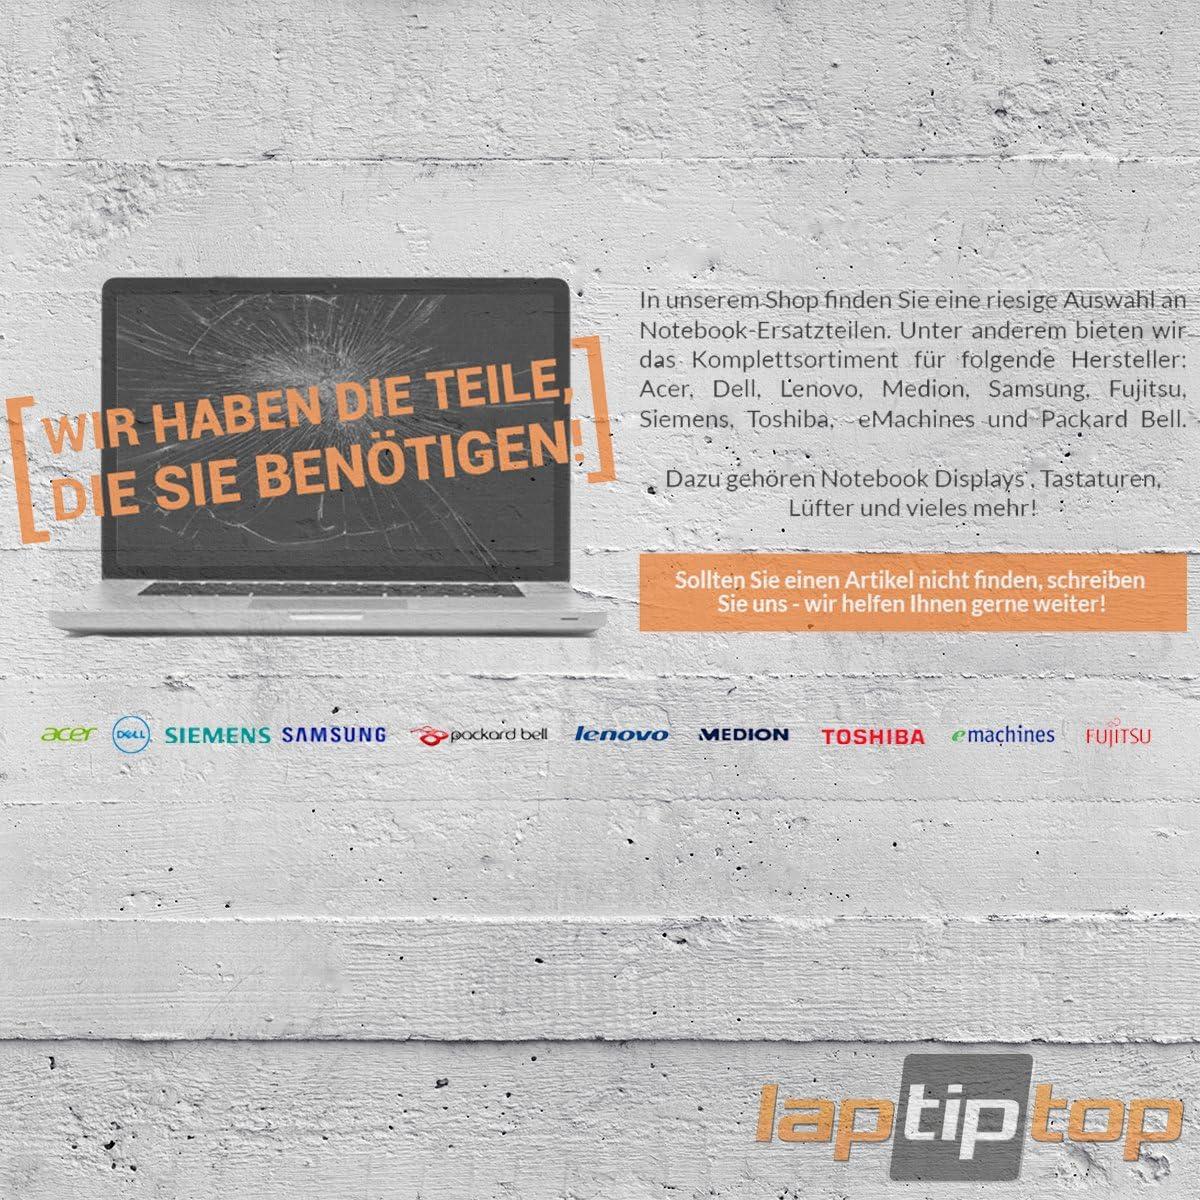 Laptiptop 15,6 LED Display Screen Glossy Ersatz f/ür Asus R556LA-XX Serie 1366x768 40pin Bildschirm Panel